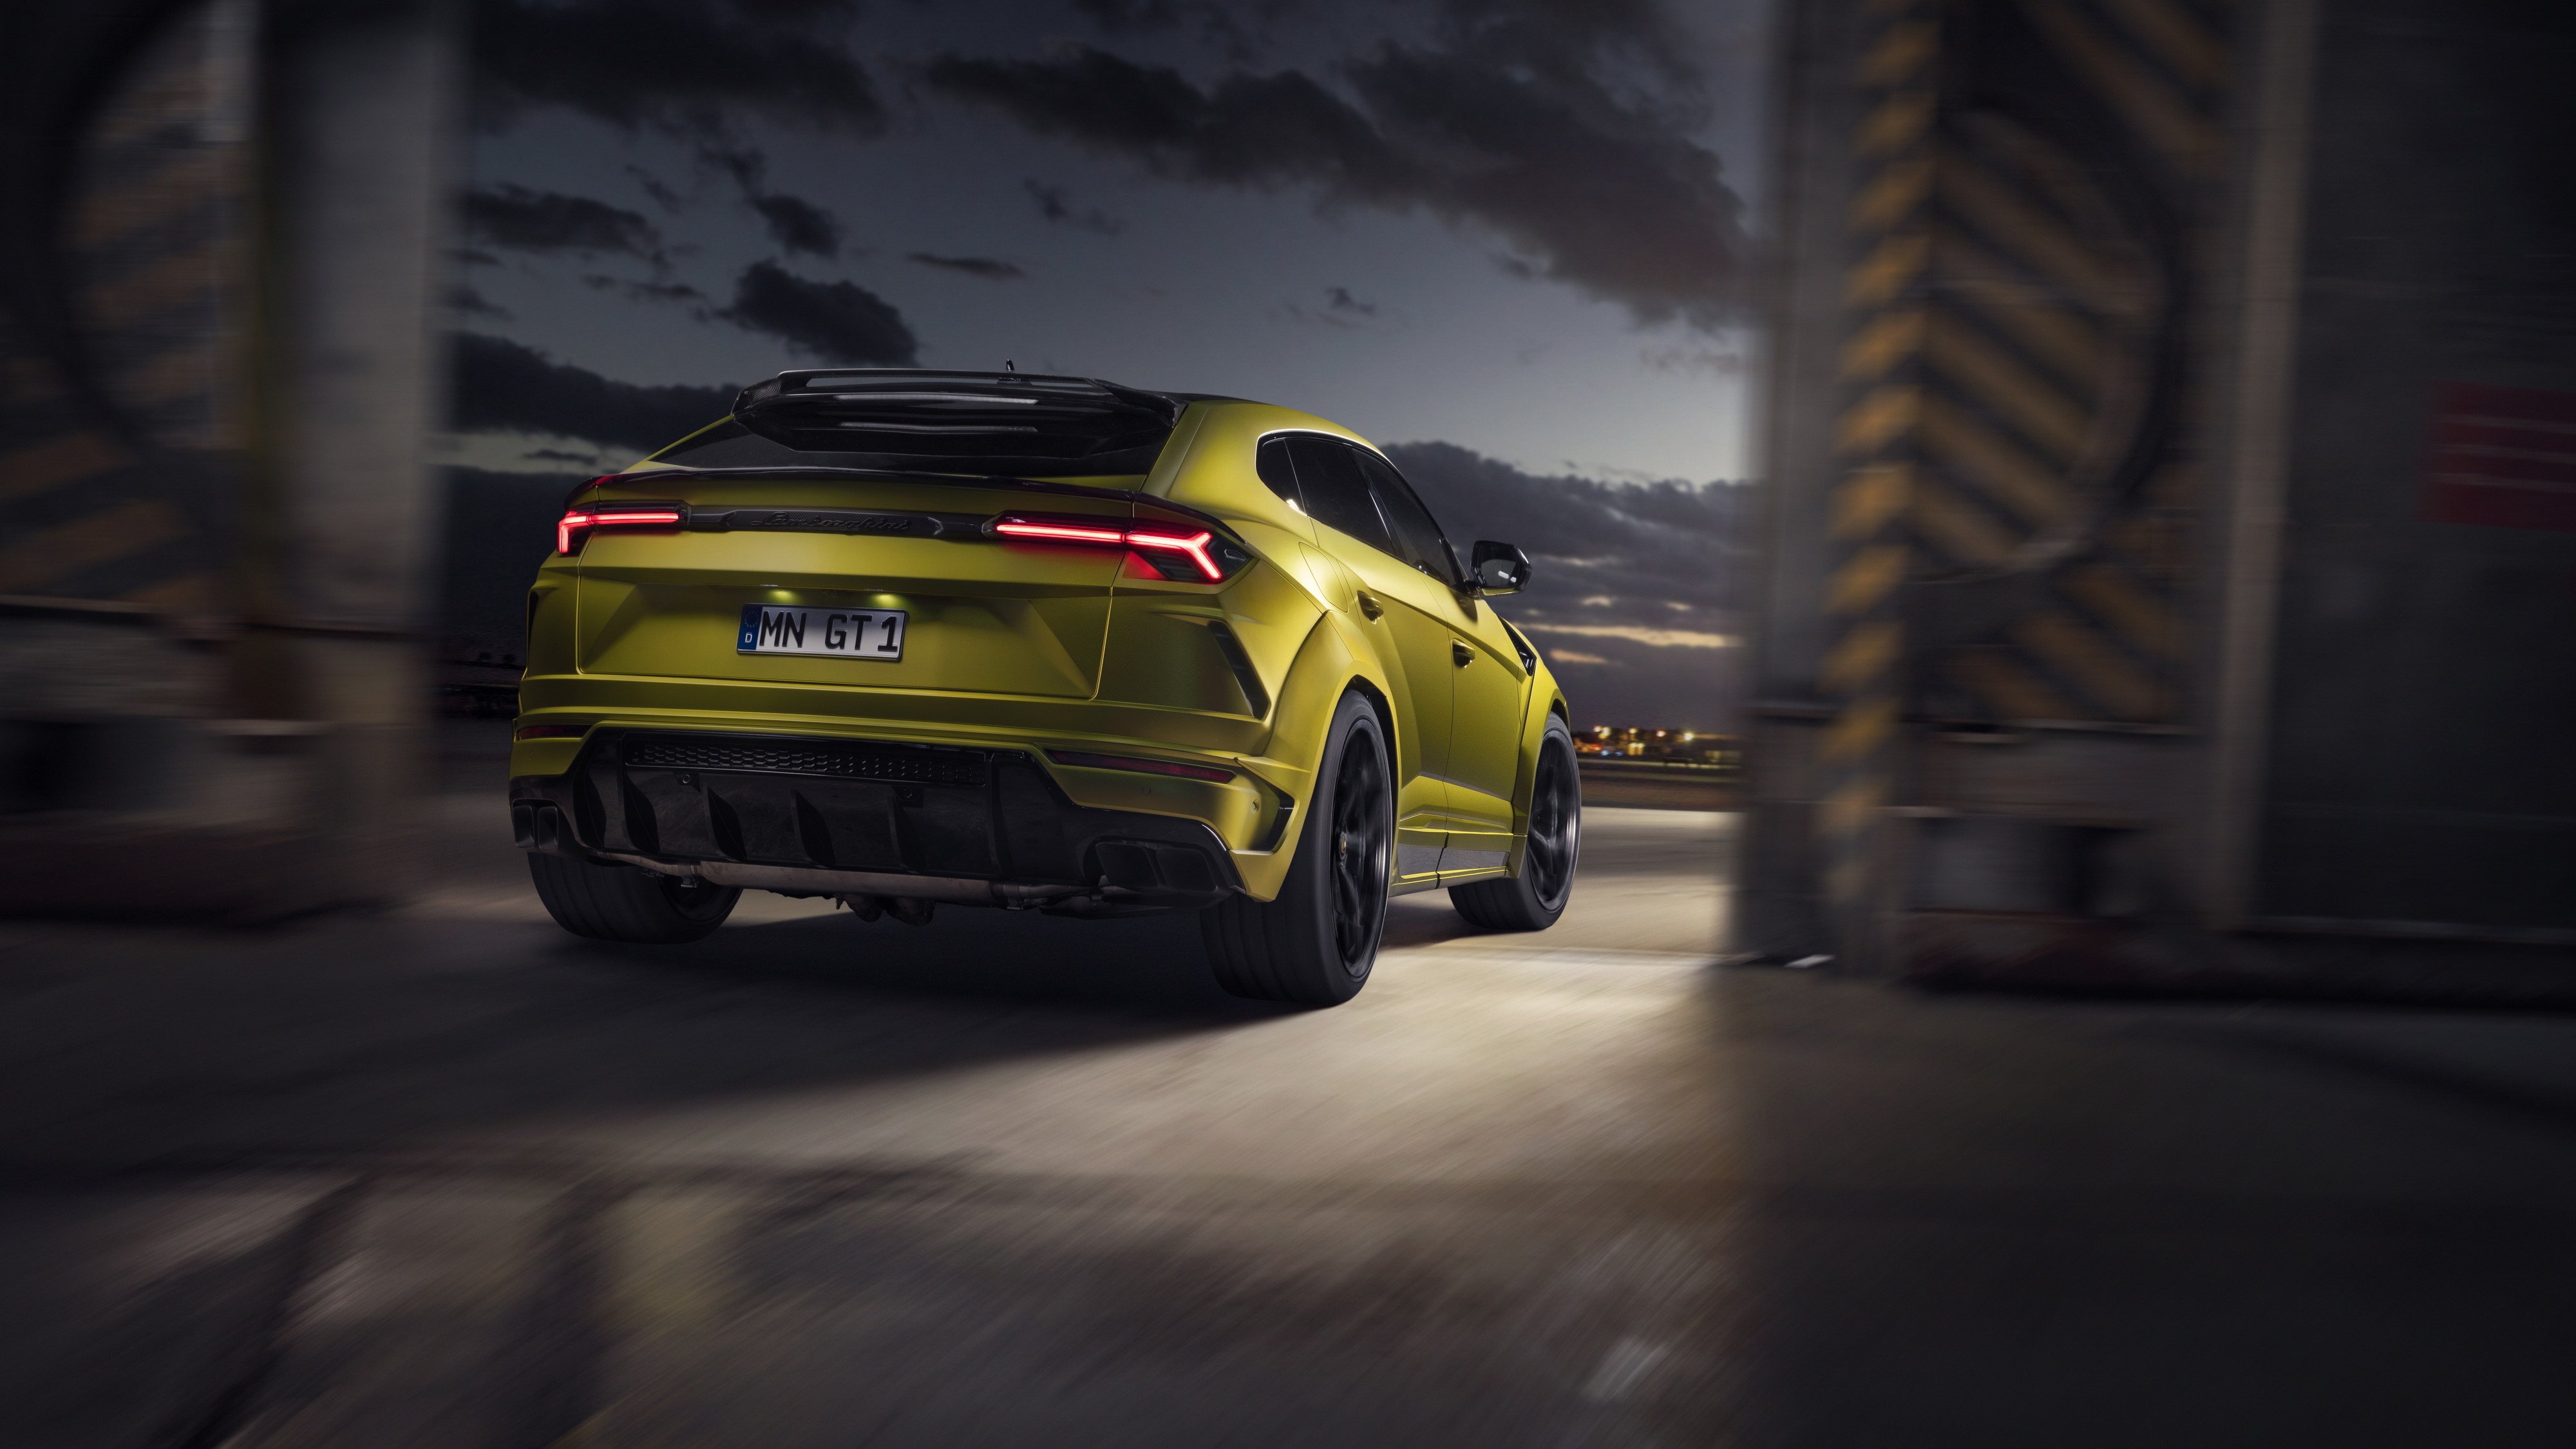 Novitec Lamborghini Urus Esteso 2019 4K 10 Wallpaper | HD ...